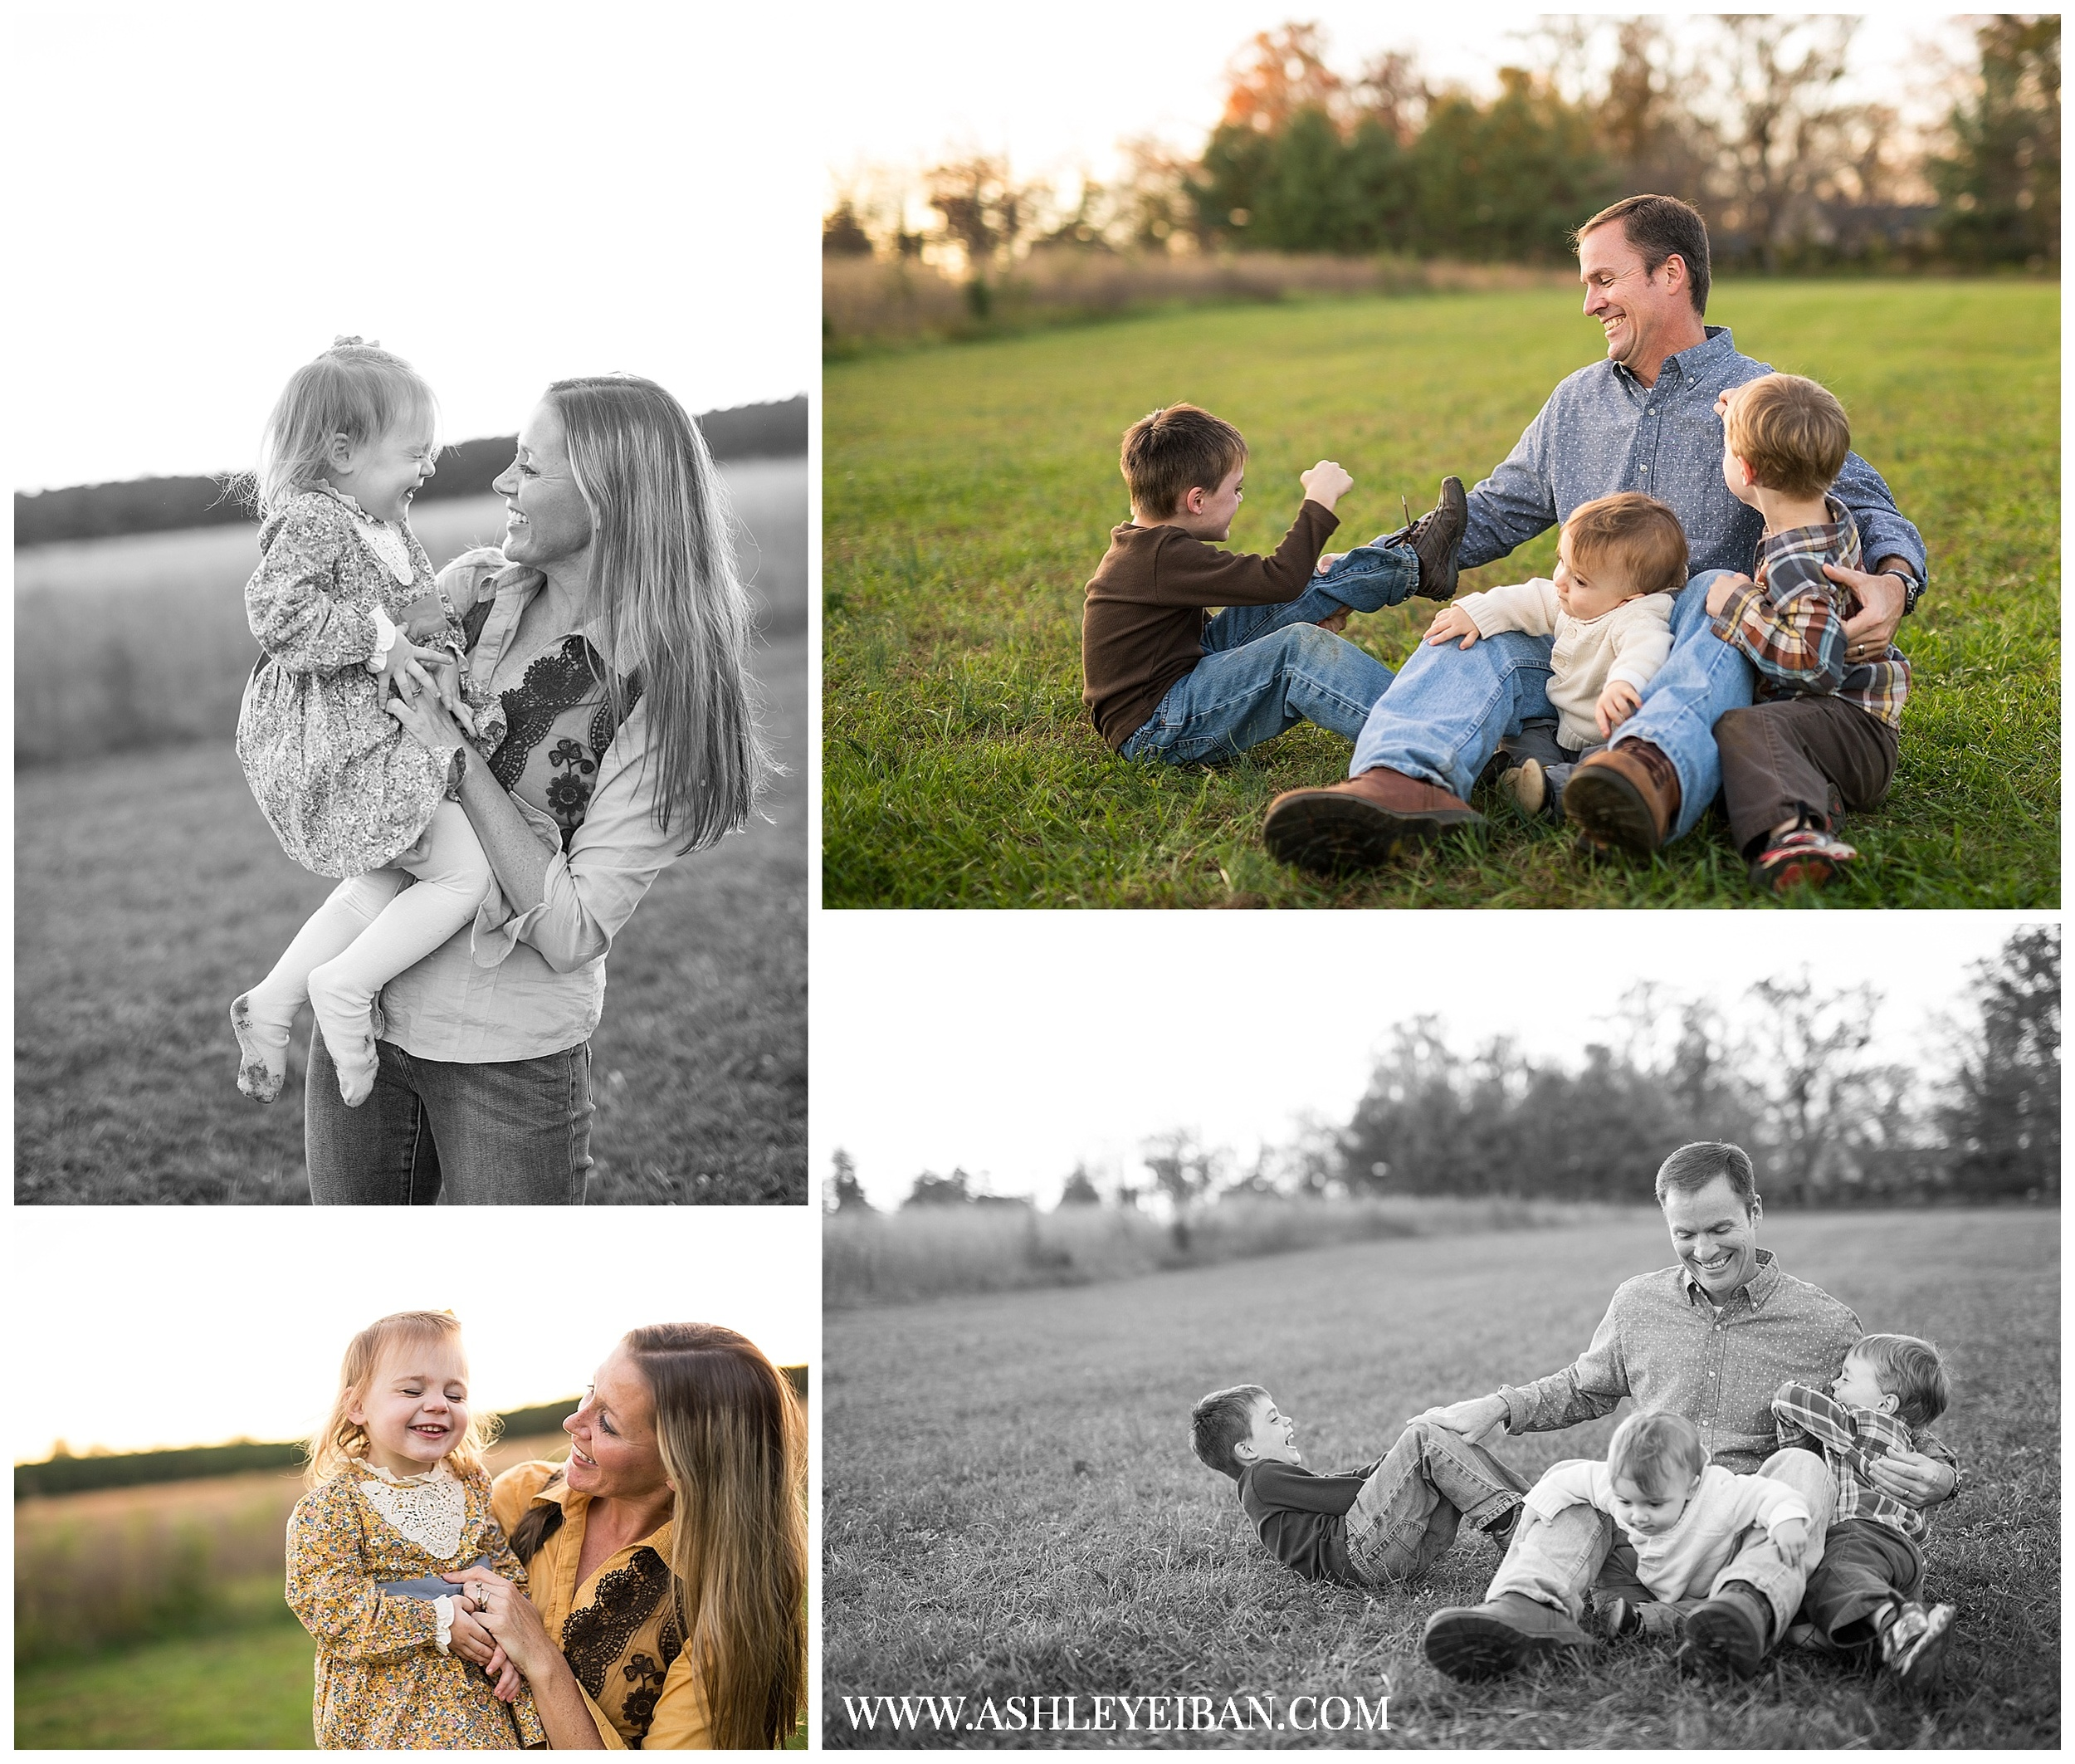 Lynchburg, Virginia Family Photographer || Central Virginia Wedding & Portrait Photographer  || Ashley Eiban Photography || www.ashleyeiban.com